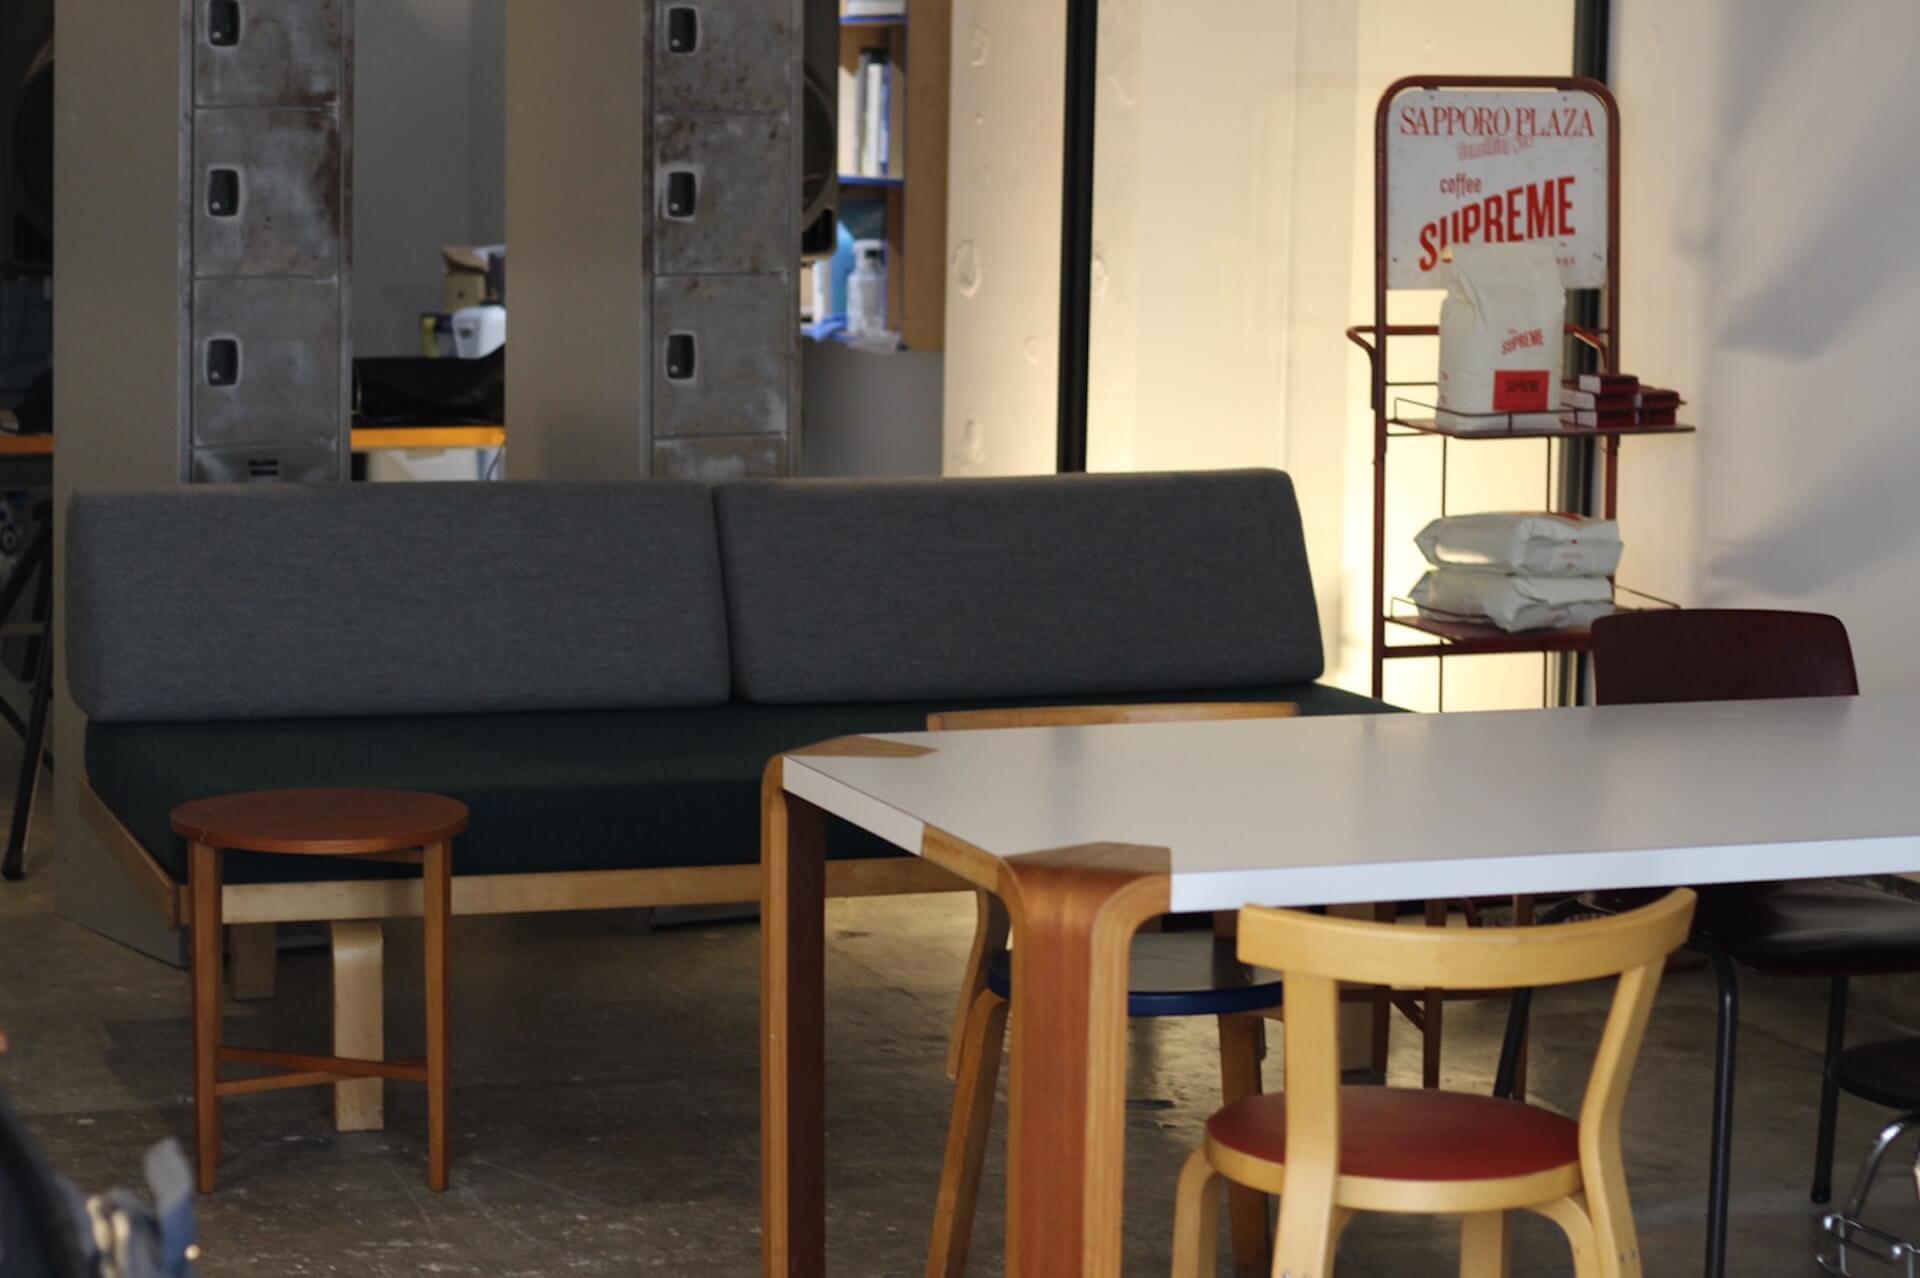 Coffee Supremeプロデュースのカフェ「Parlors」が馬喰横山の新施設みどり荘にオープン gourmet211014_parlors_4